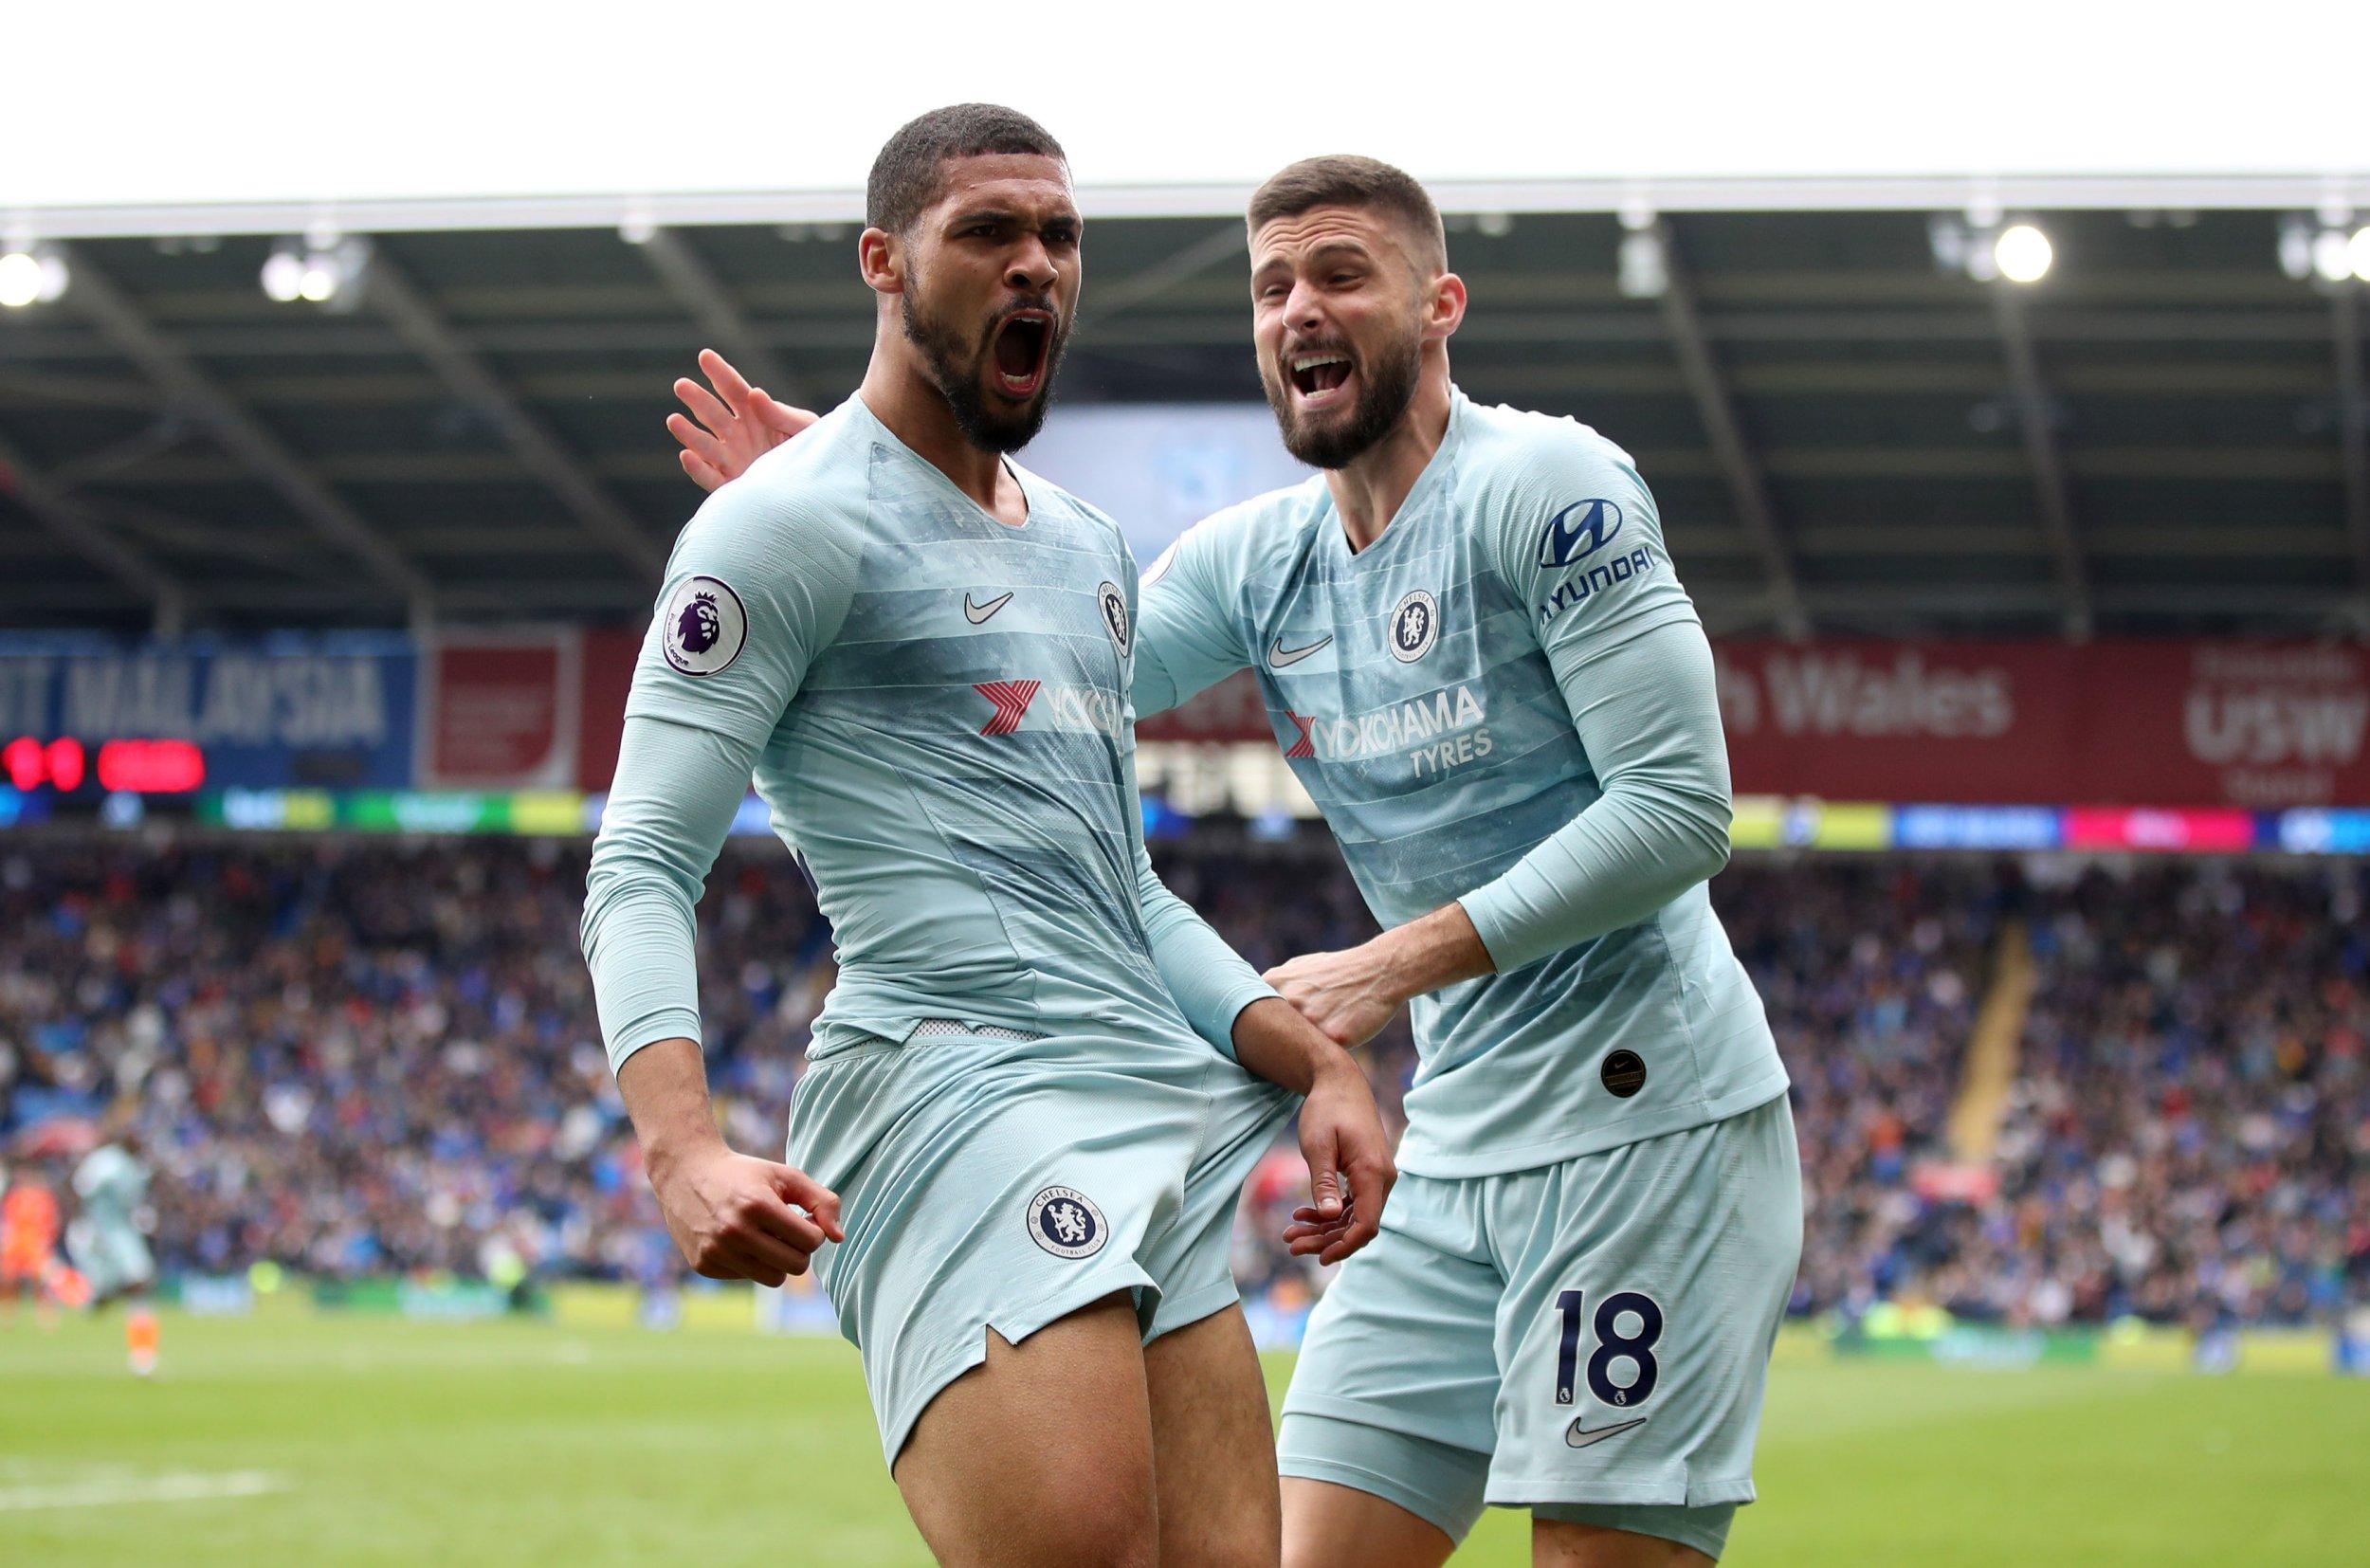 Ruben Loftus-Cheek reveals how Maurizio Sarri and Gianfranco Zola inspired Chelsea's victory over Cardiff